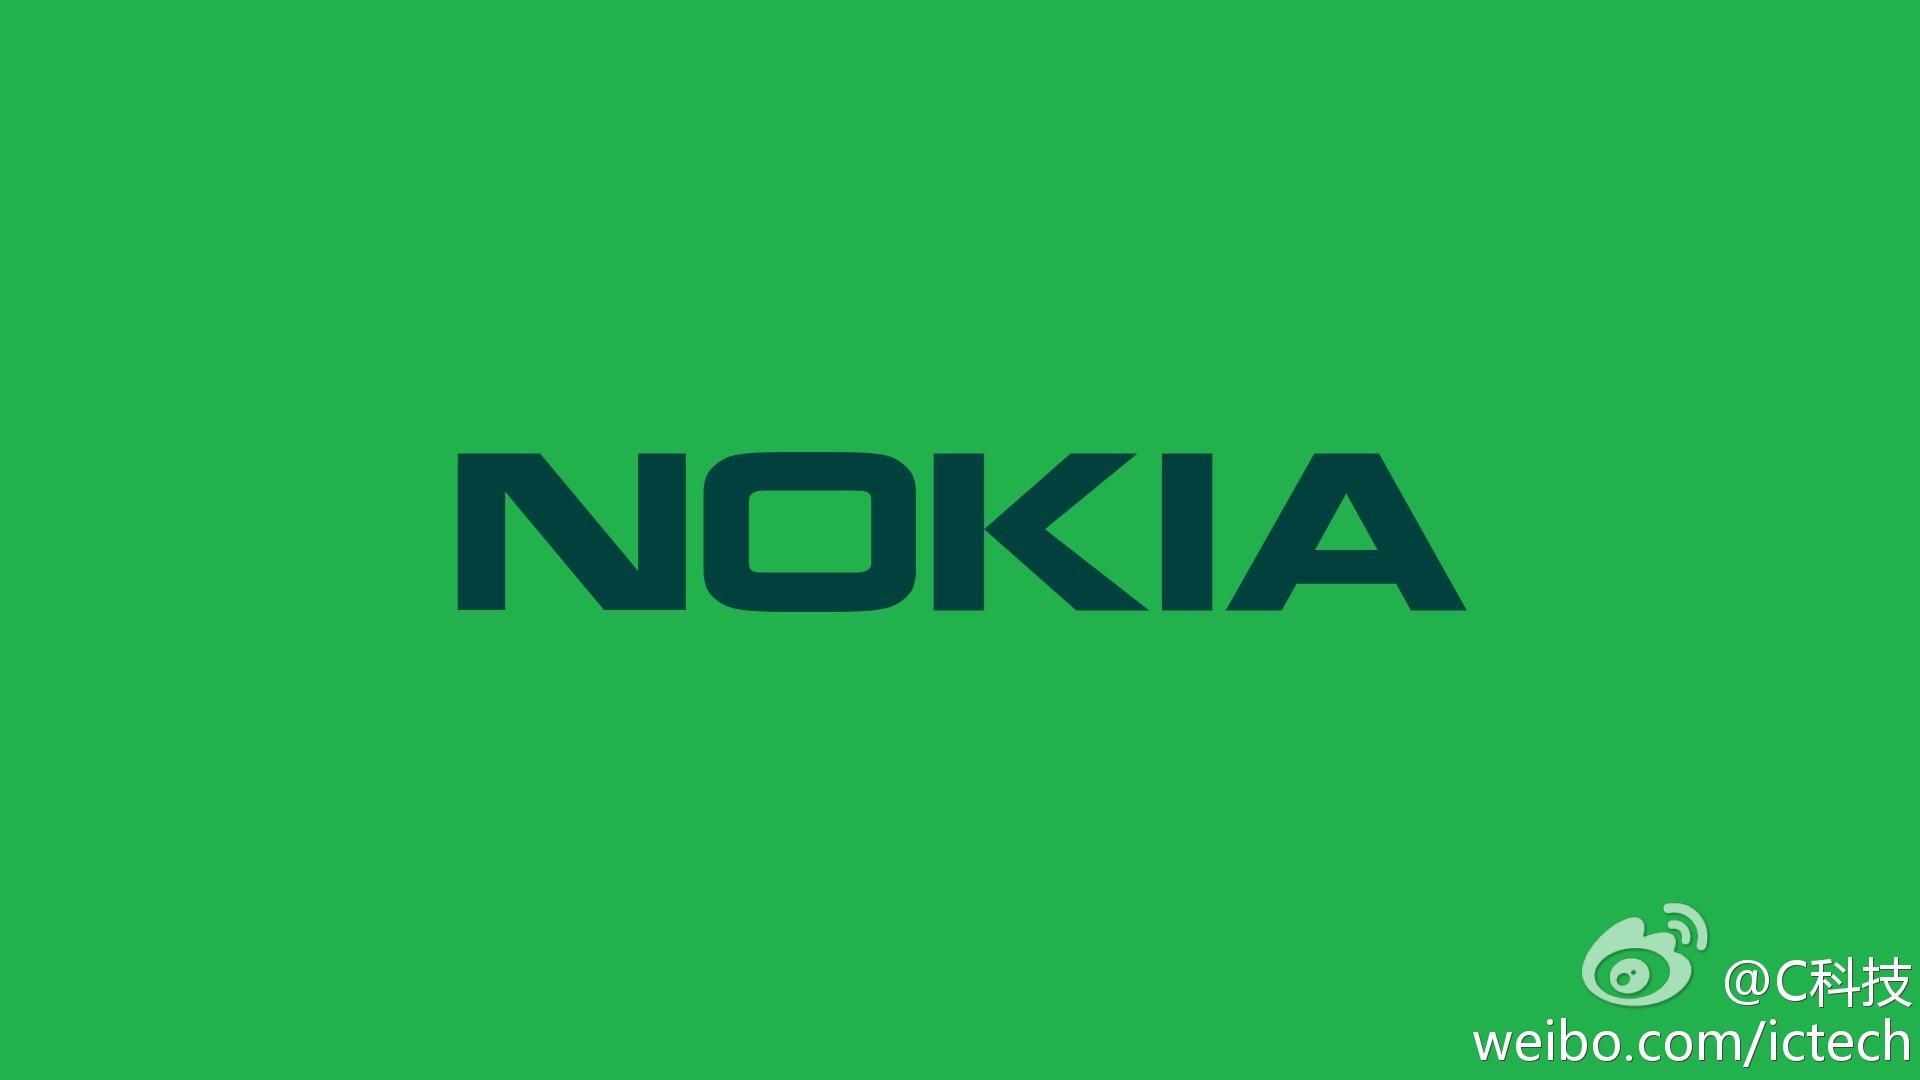 Nokia Logo Wallpapers Wallpaper Cave